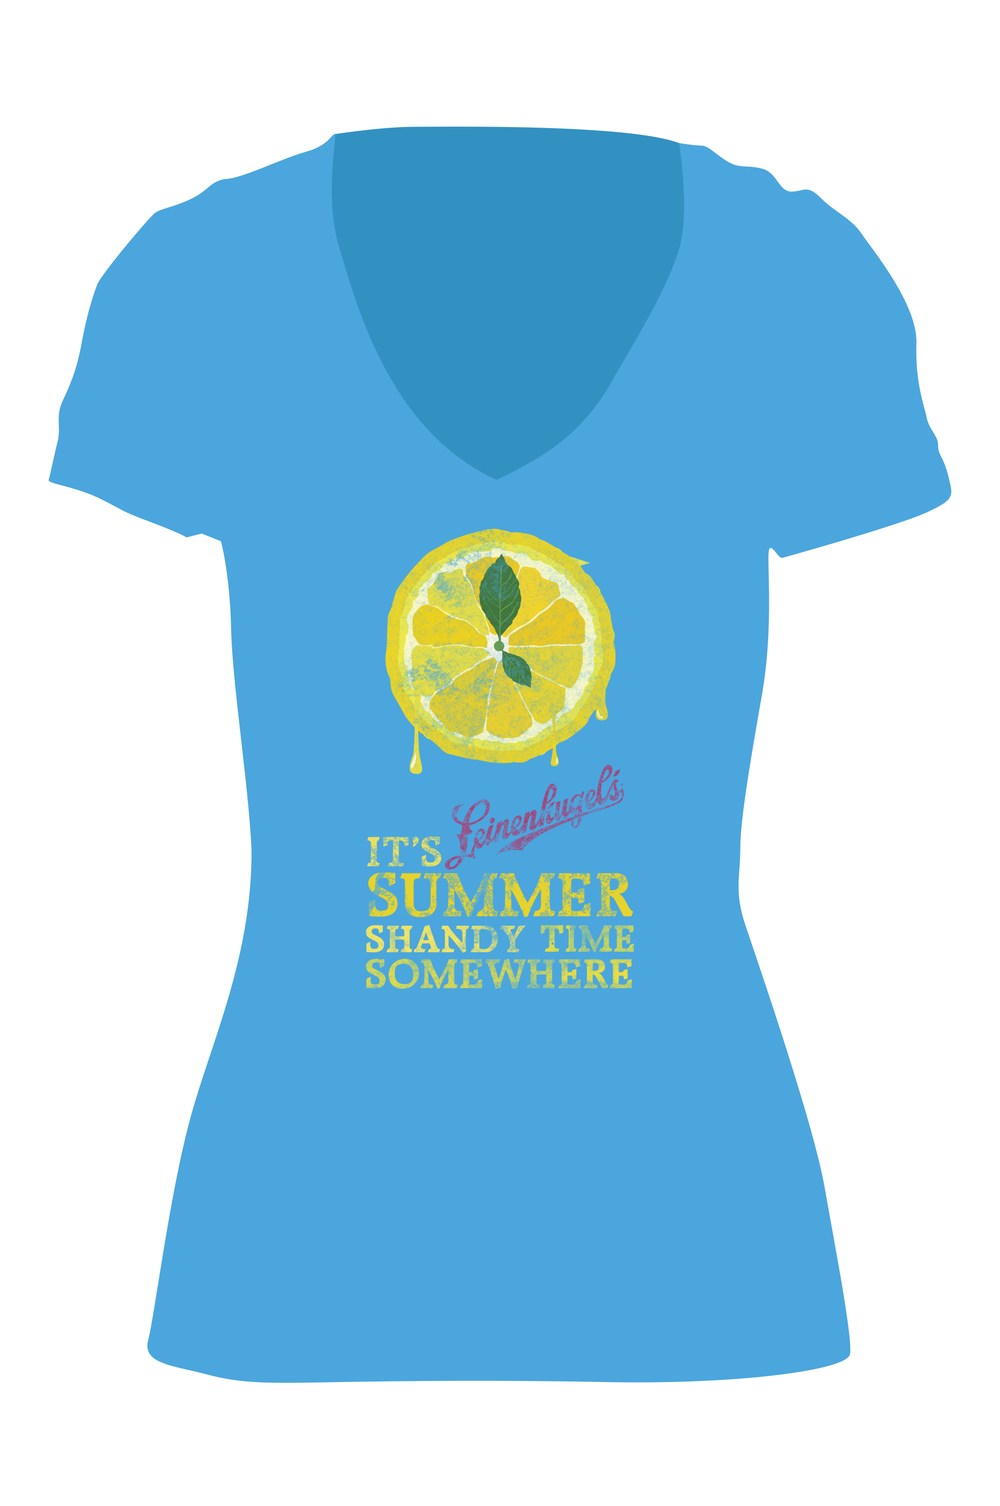 Leinenkugel's Tshirt - Summer Shandy